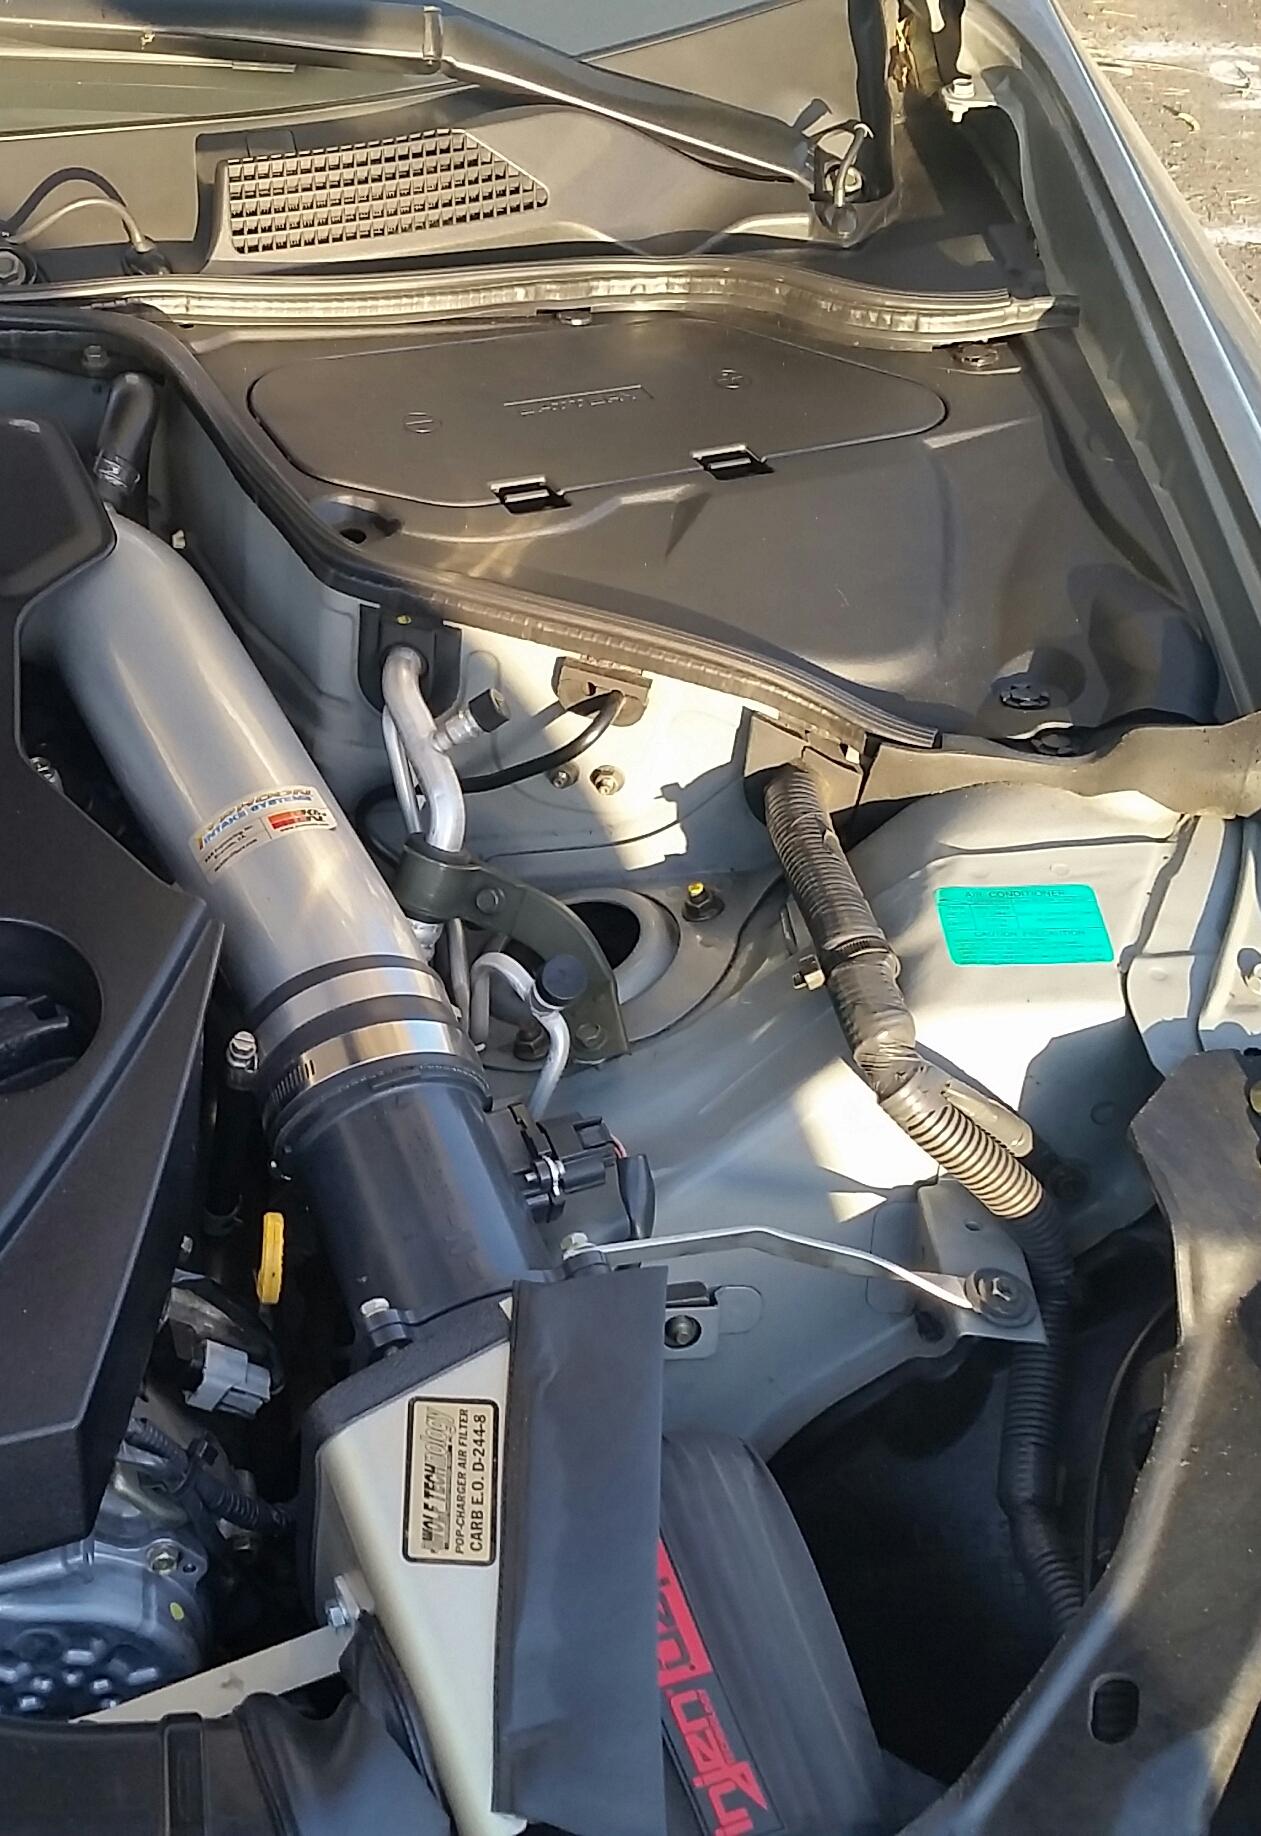 Jdm Nissan Battery Cover Kit For The Infinit G35